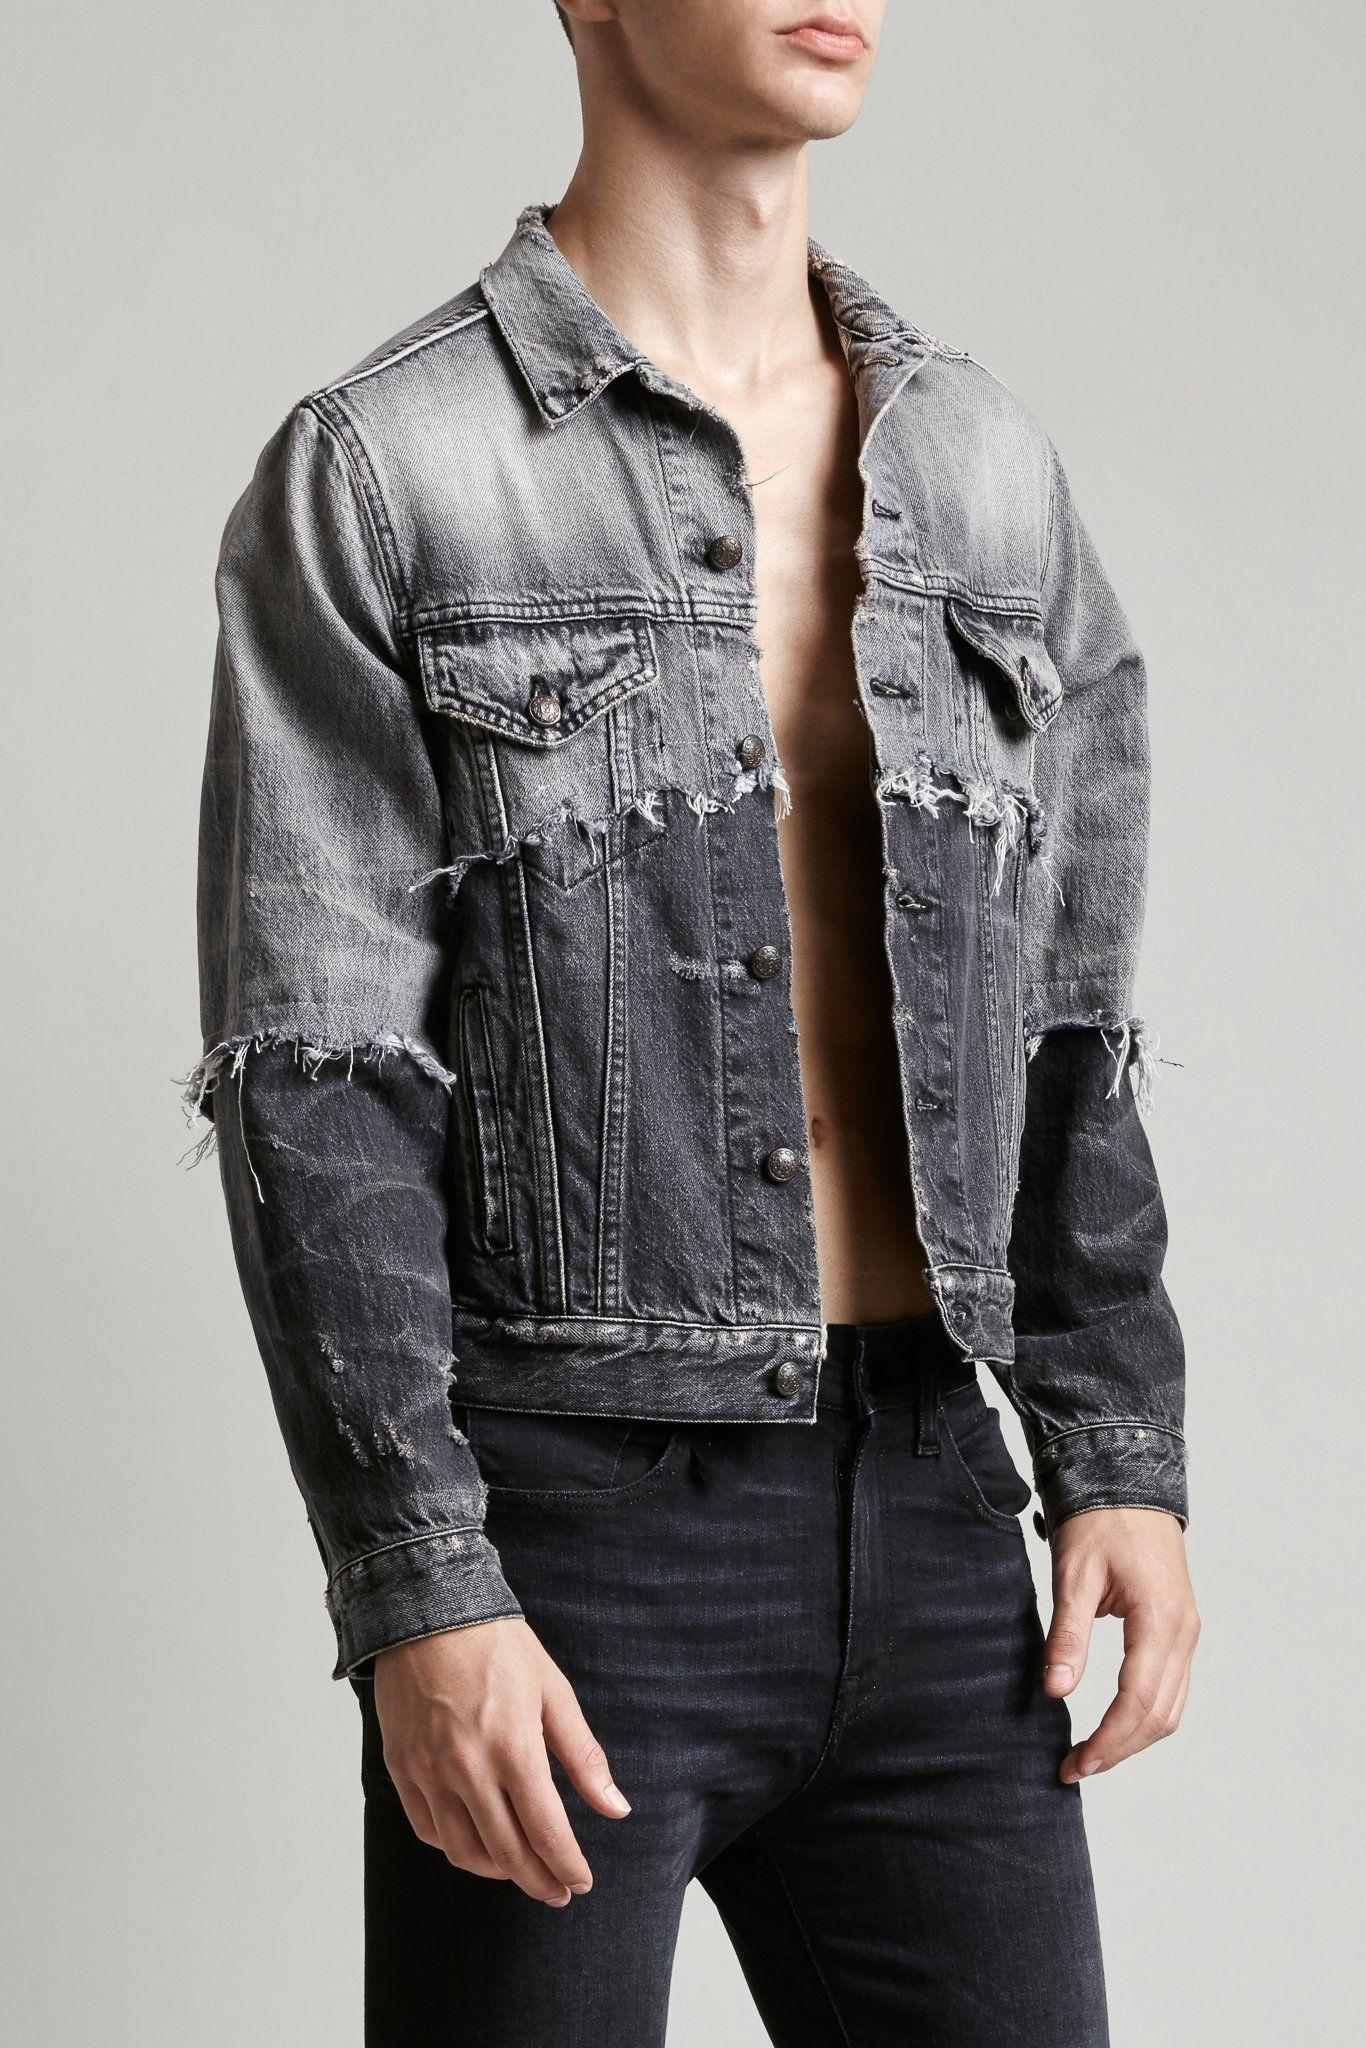 Double Shredded Sky Trucker Denim Jacket Trend Fashion Hacks Clothes Denim Fashion [ 2048 x 1366 Pixel ]